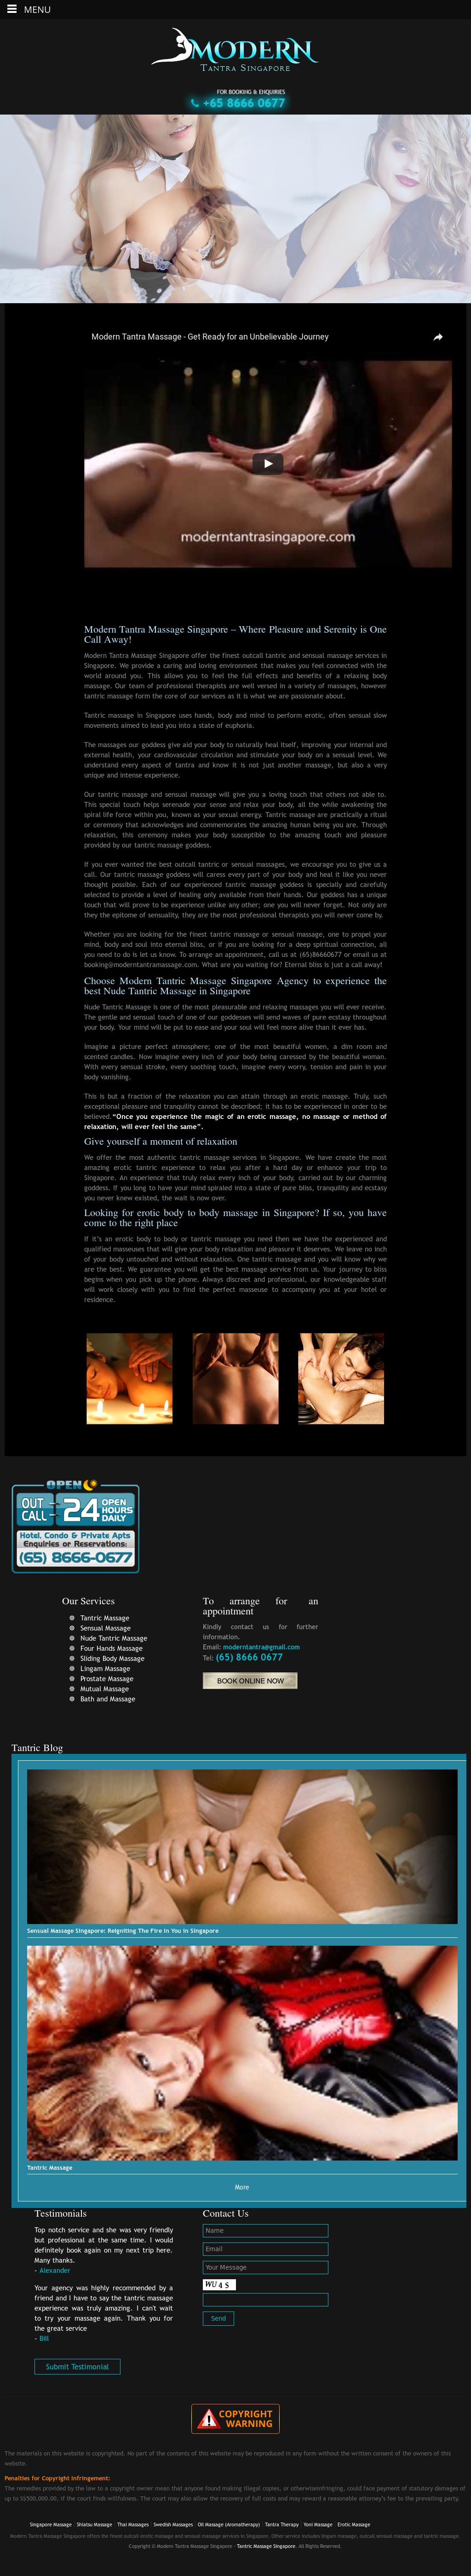 Pussy massage gif image